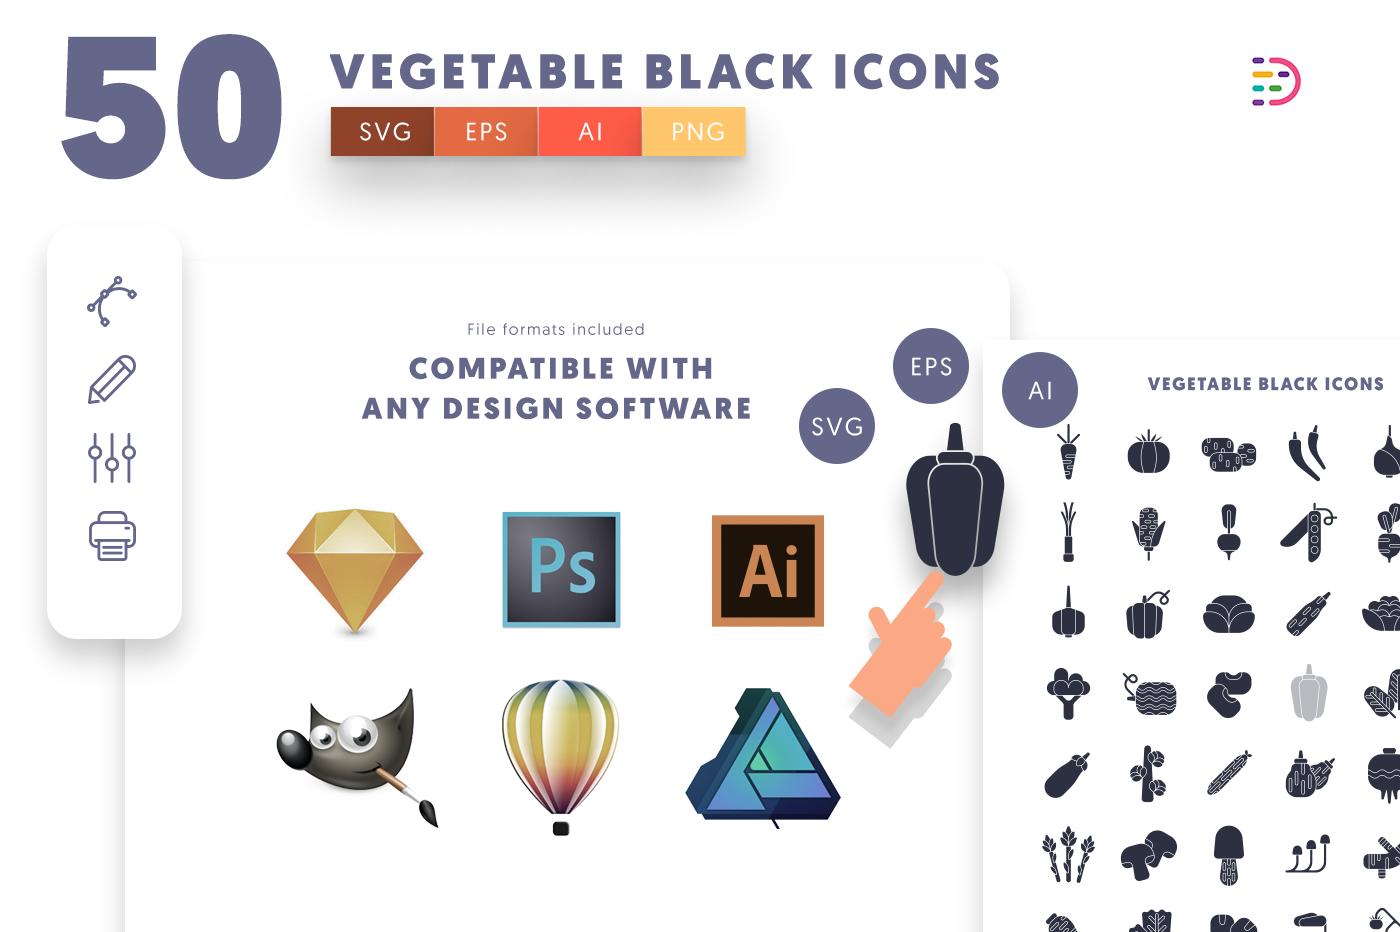 full vector 50 Vegetable Black Icons EPS, SVG, PNG